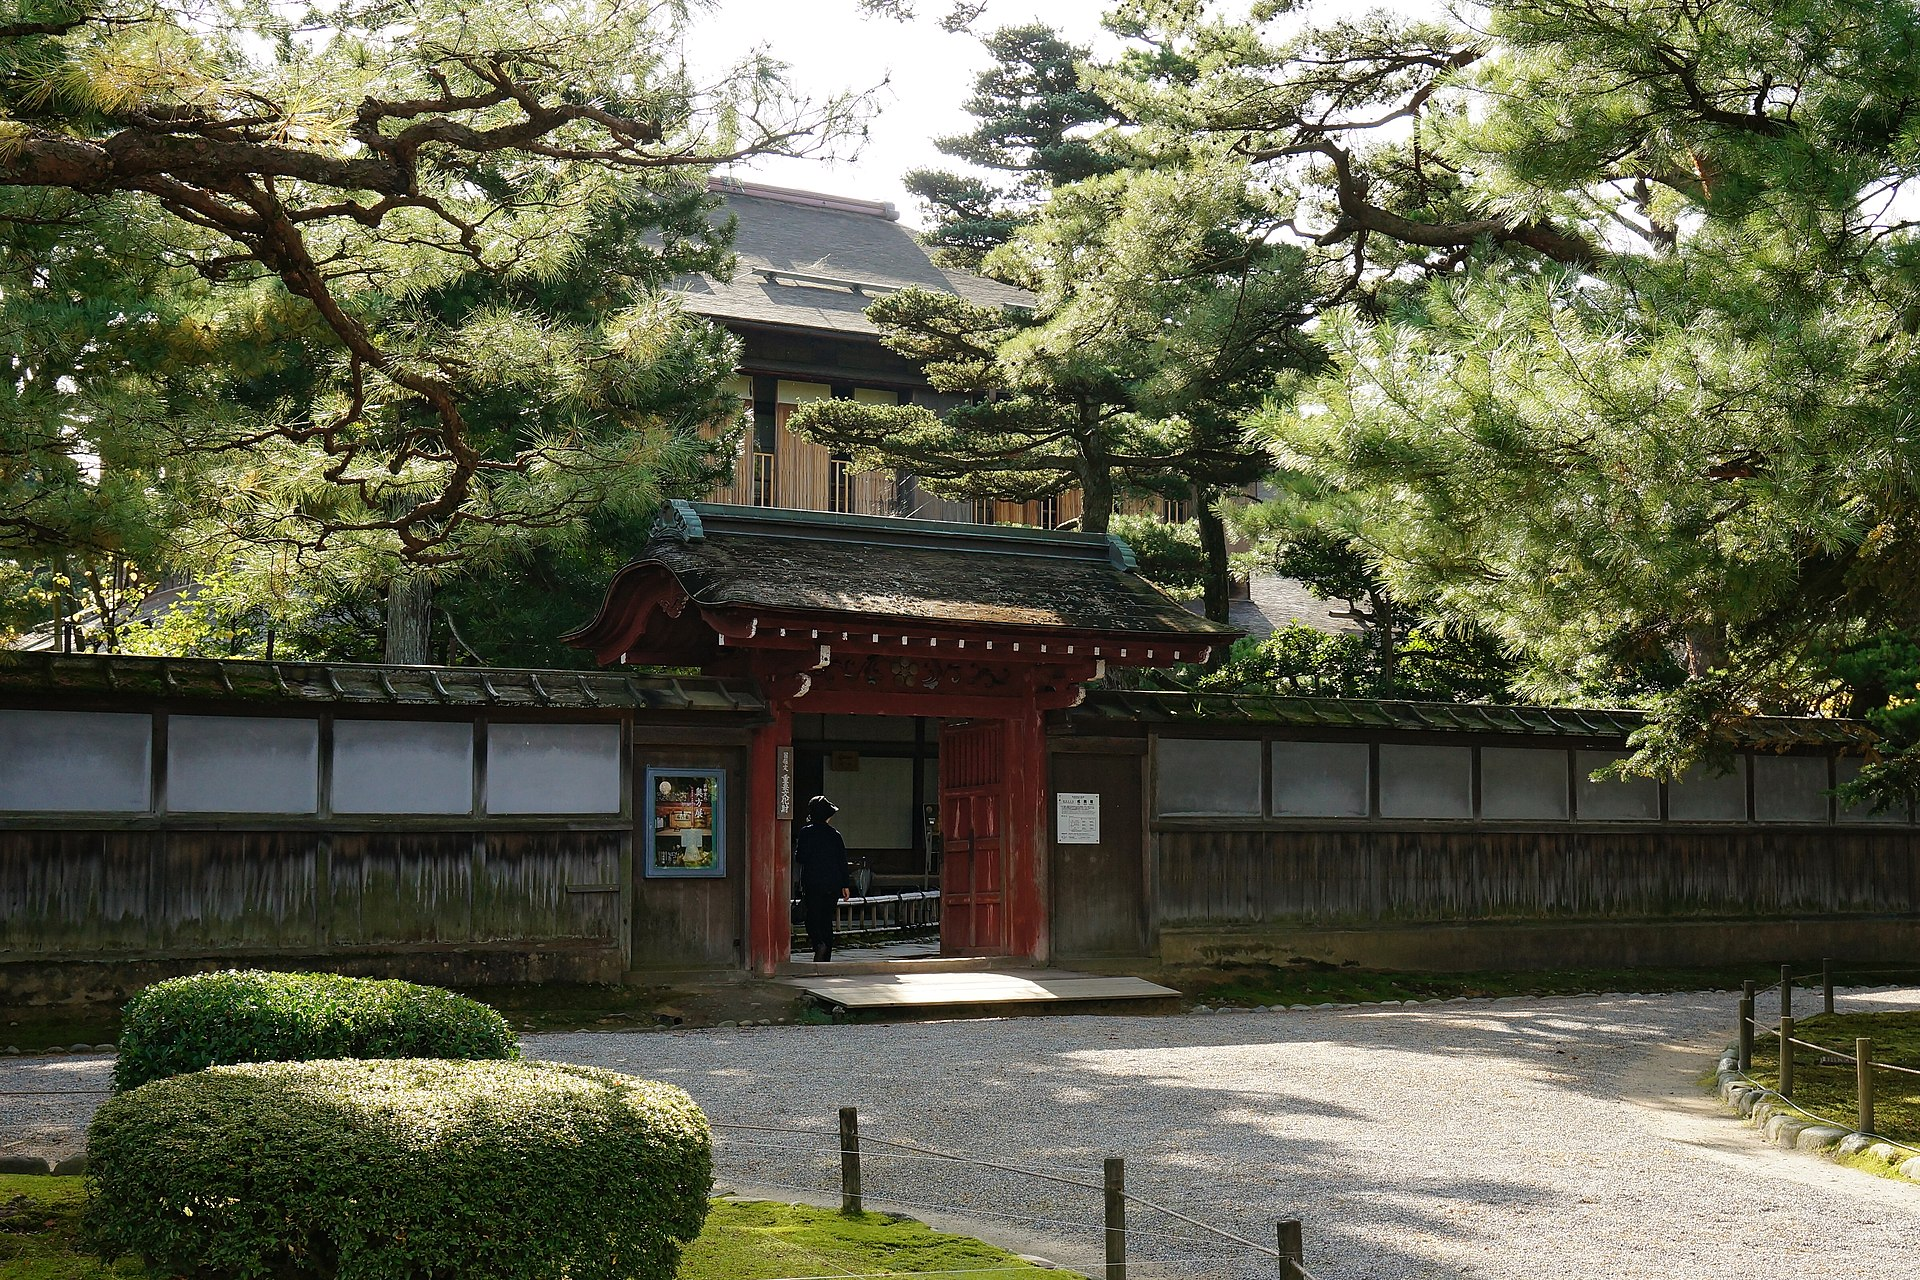 131109 Seisonkaku Kanazawa Ishikawa pref Japan10s3.jpg